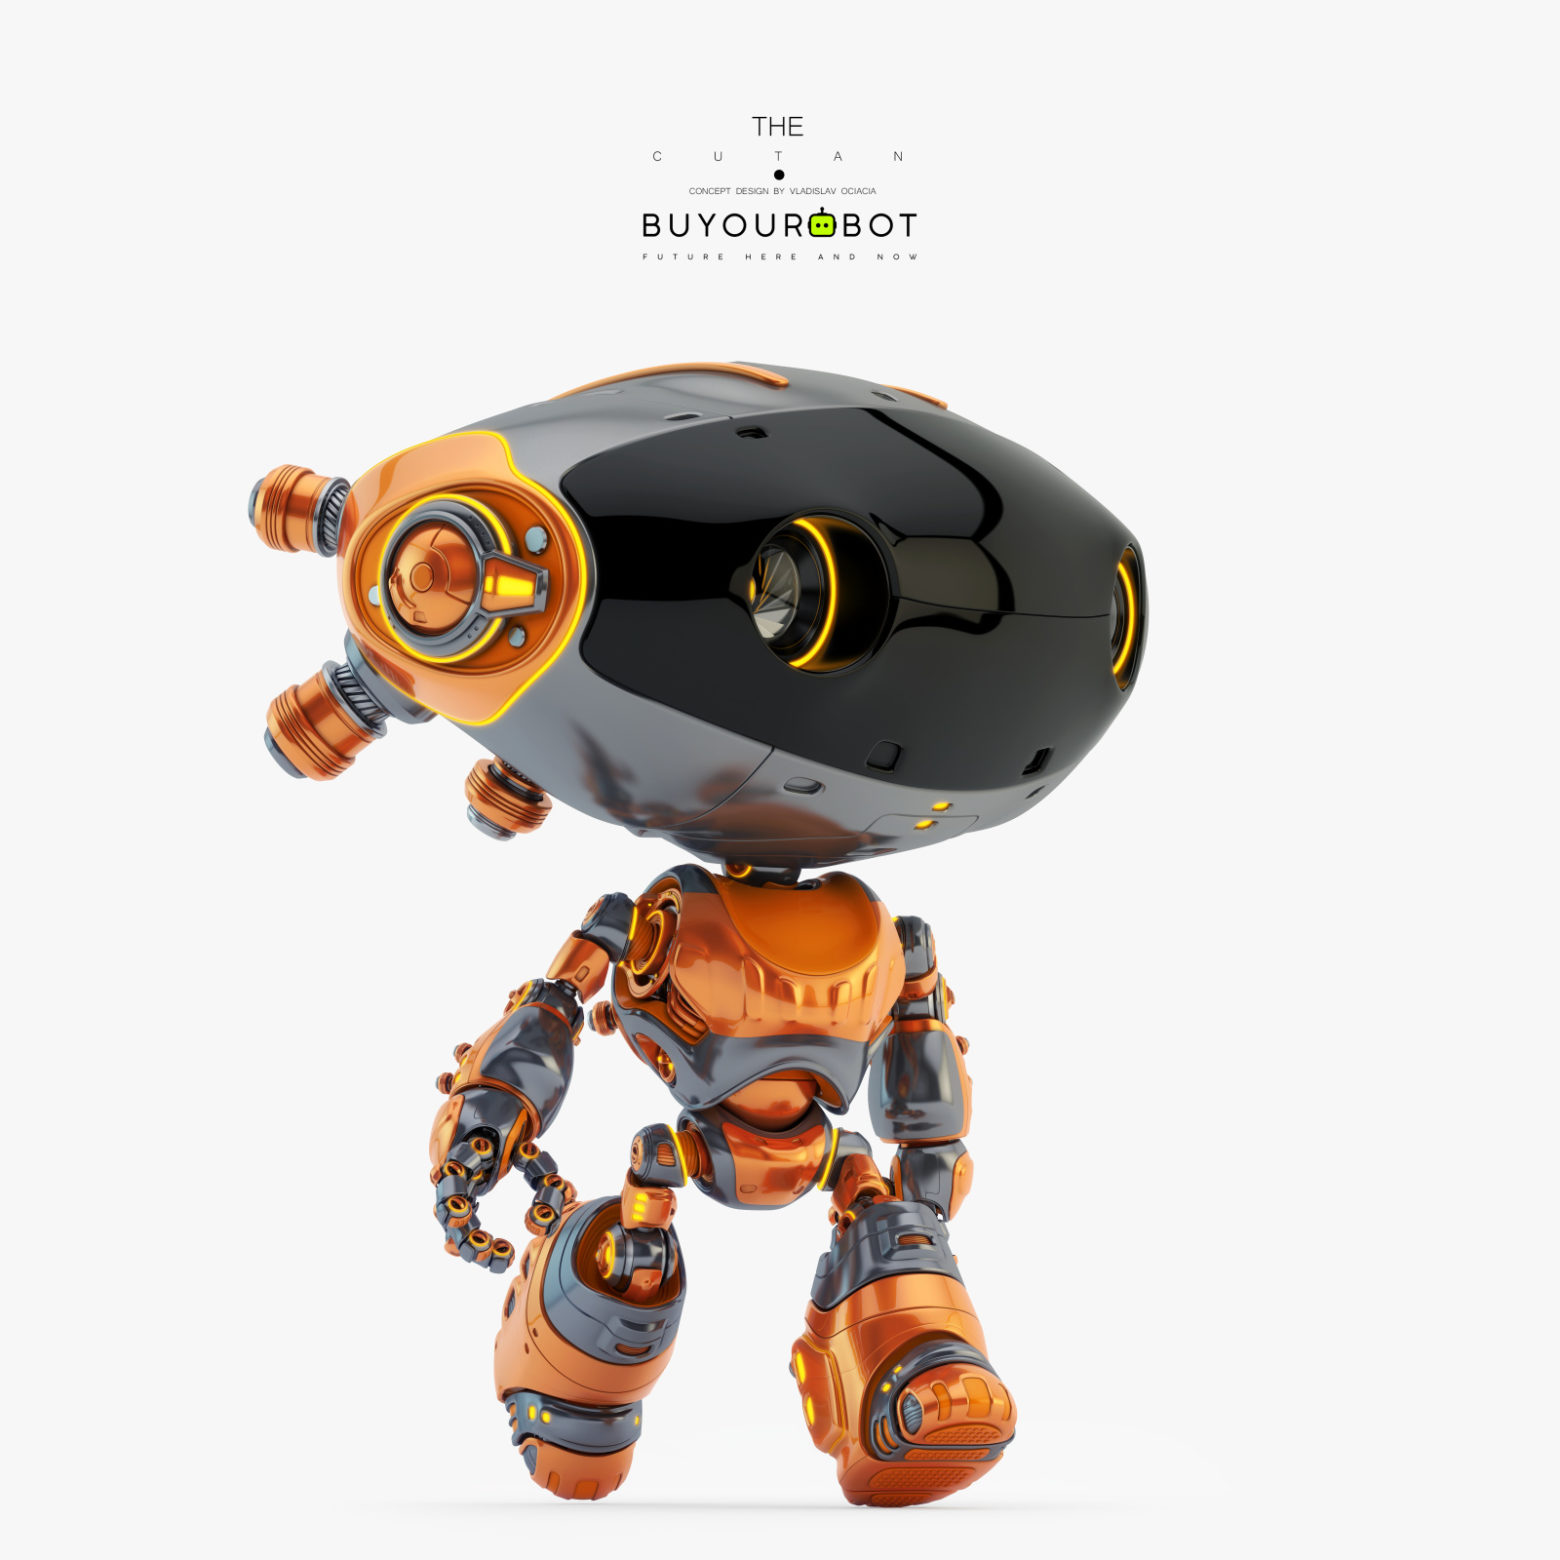 FROG TOY ROBOT I 6